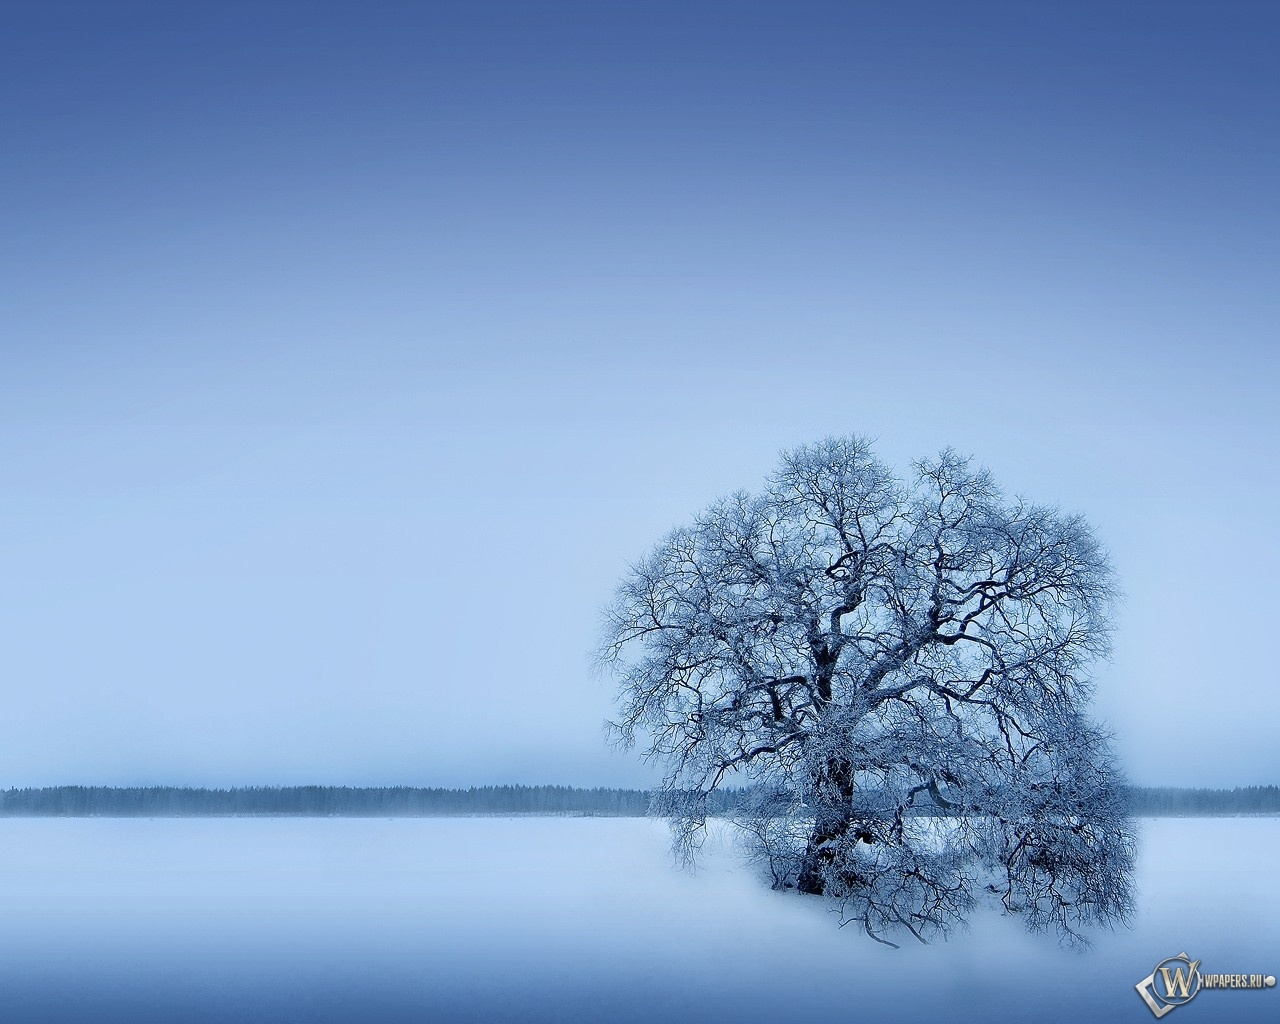 Одинокое дерево 1280x1024